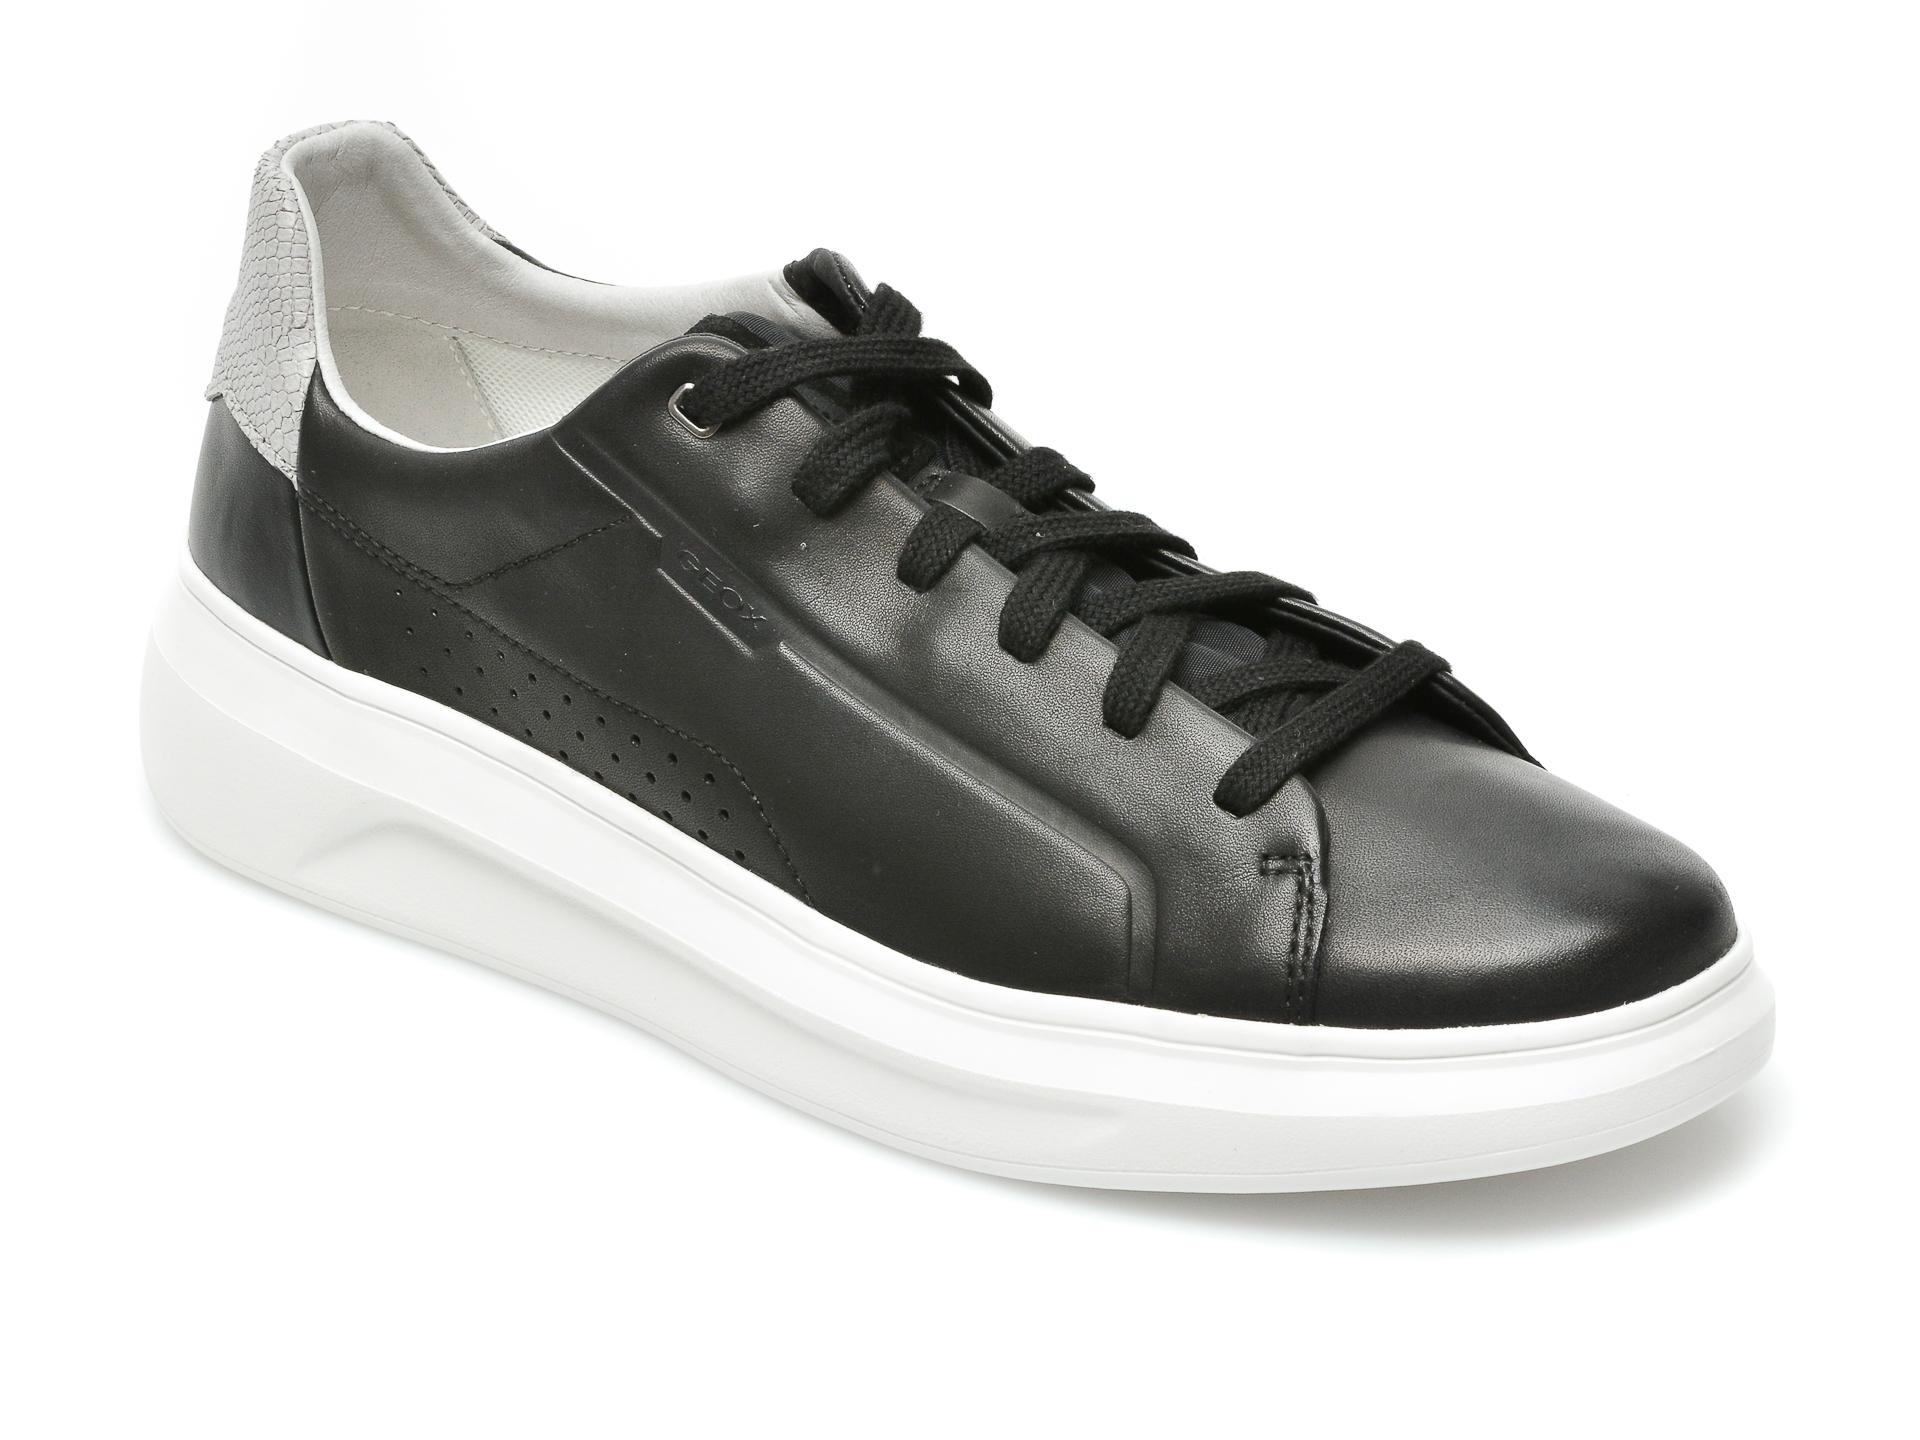 Pantofi sport GEOX negri, U15ATB, din piele naturala imagine